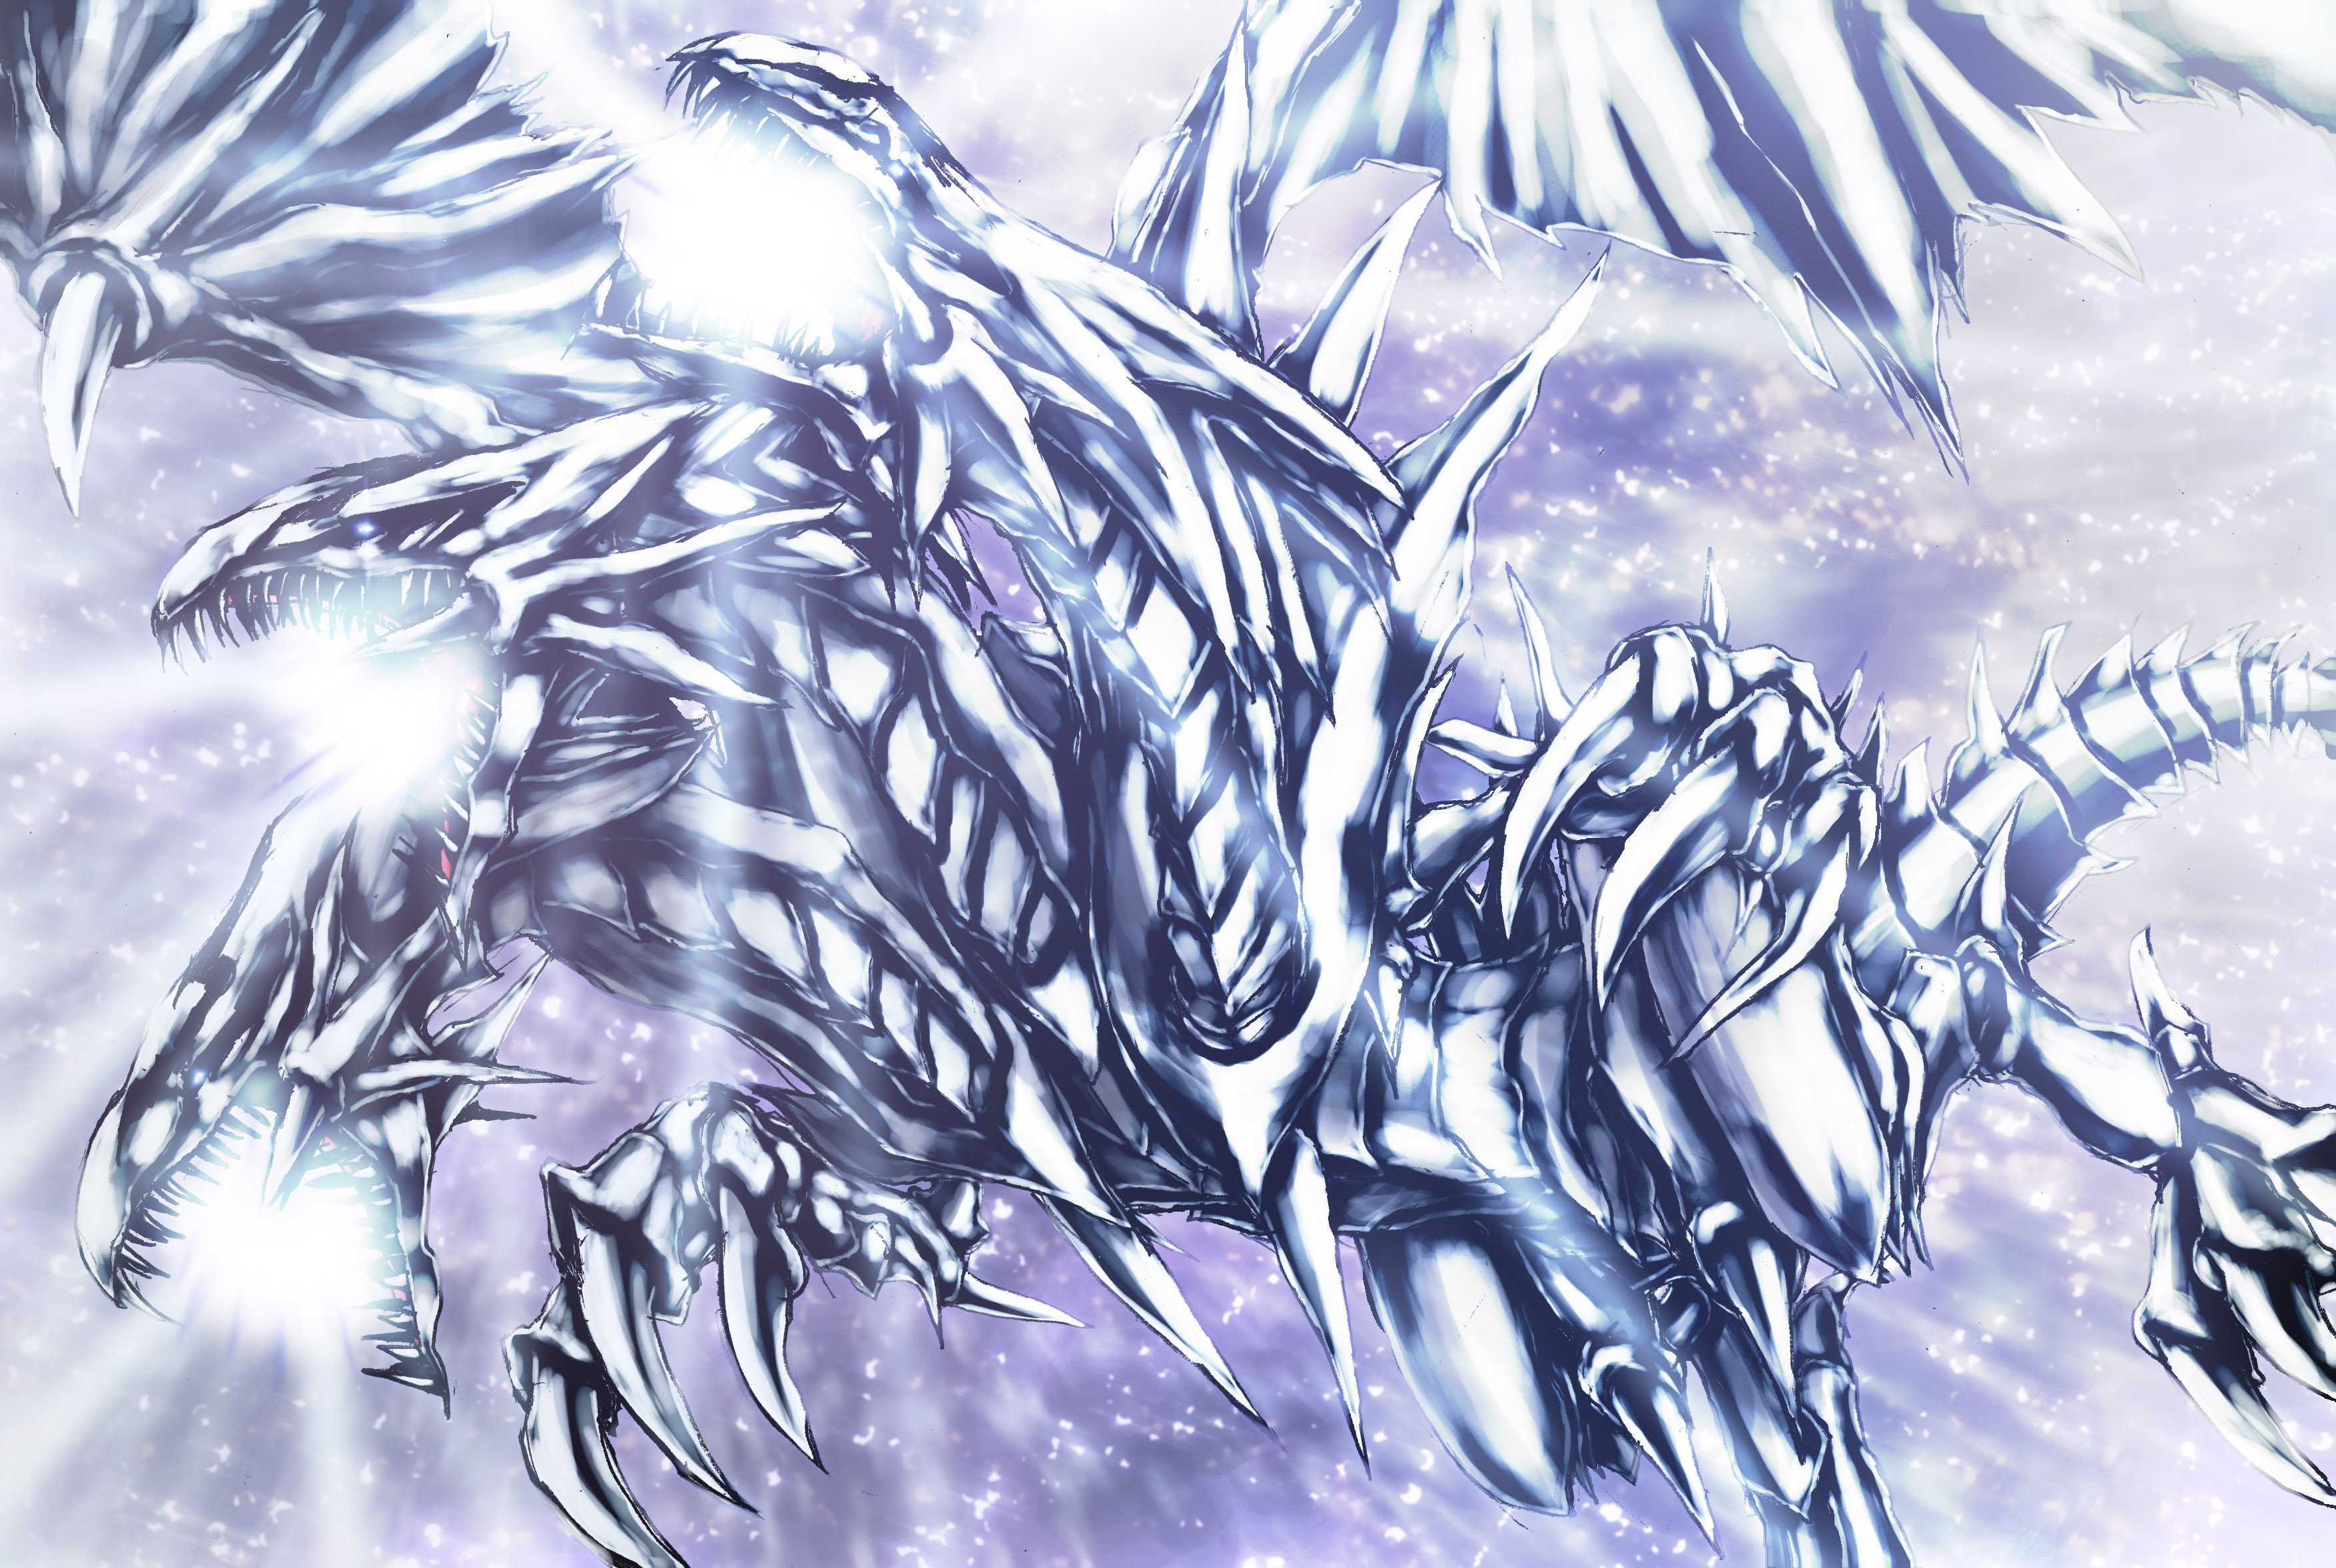 blue eyes ultimate dragon yu gi oh duel monsters image